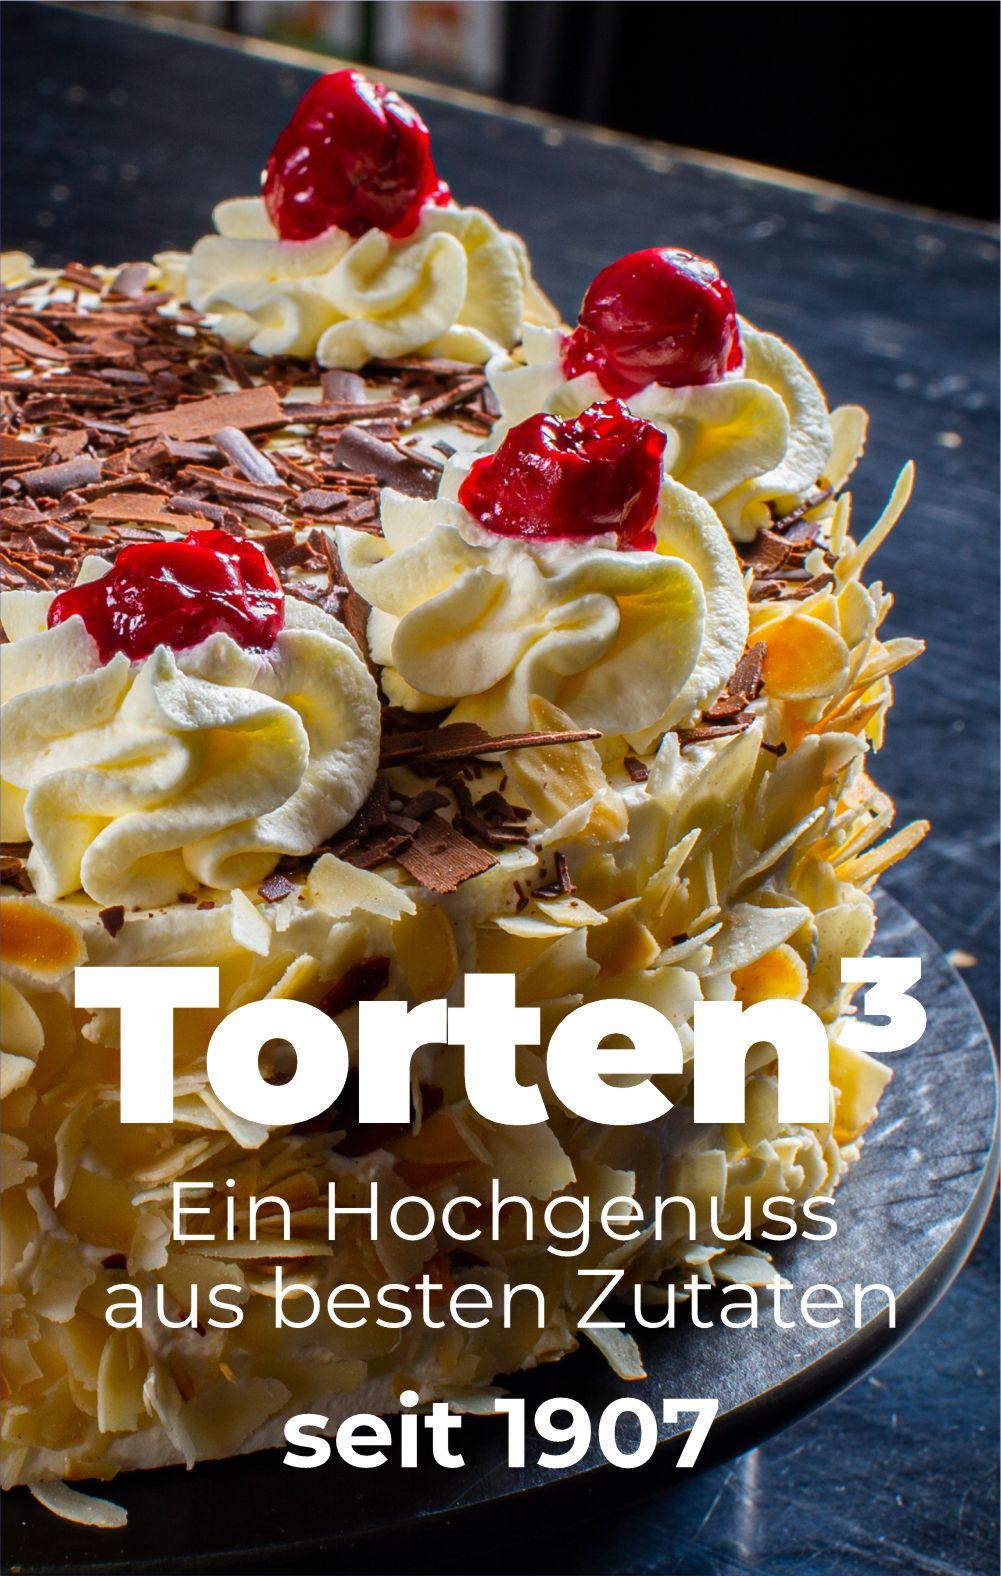 tismes_torten_002_xs